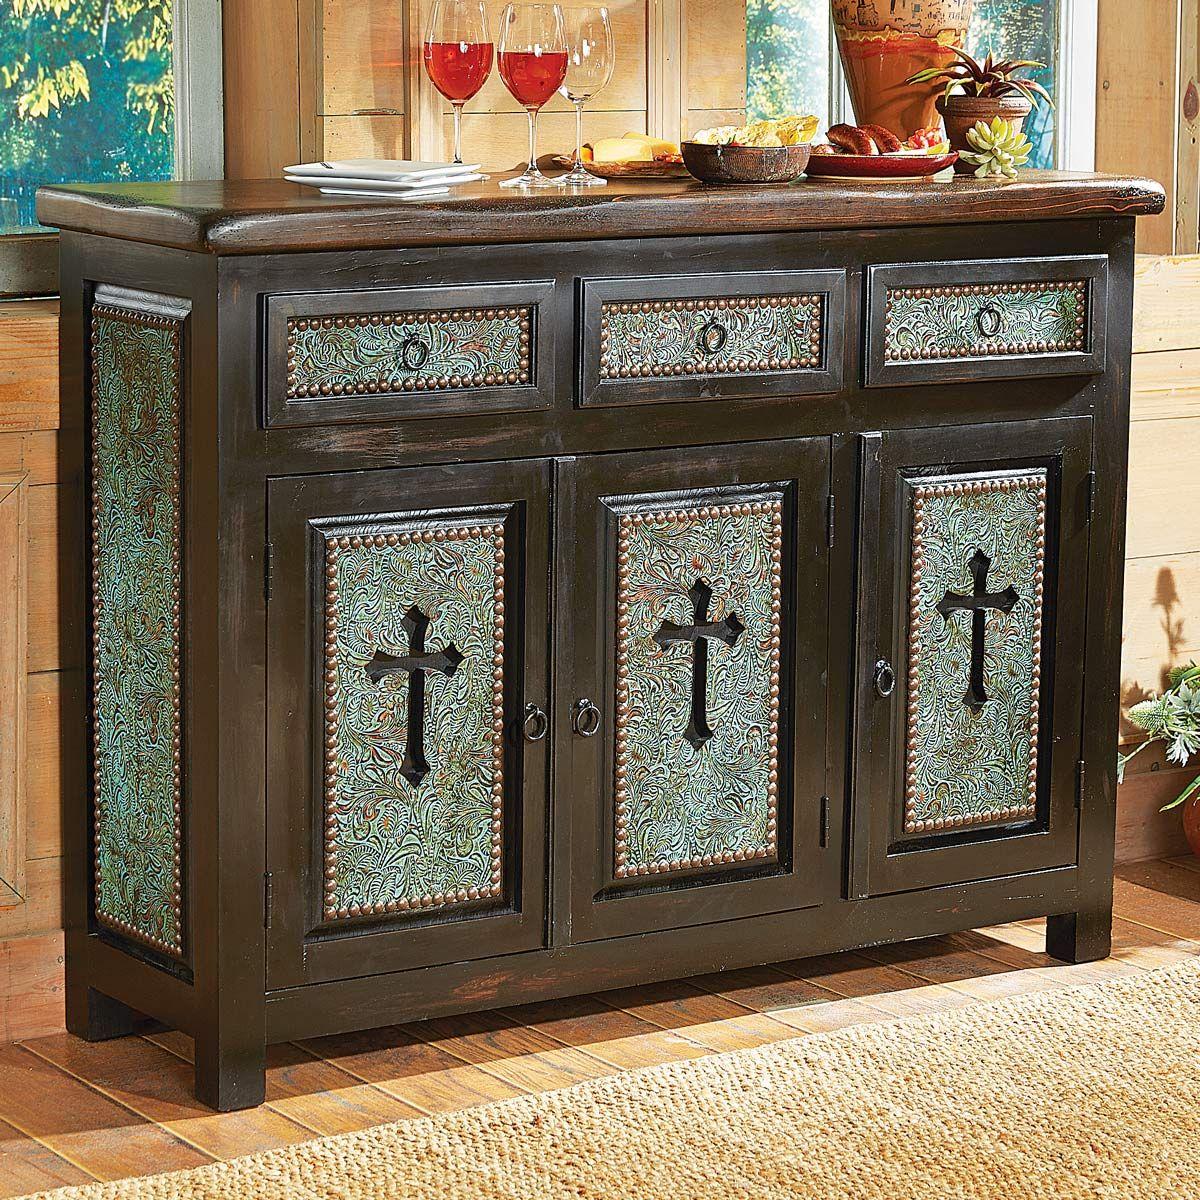 Turquoise Santa Cruz Cross Cabinet maybe I can make one similar….so ...